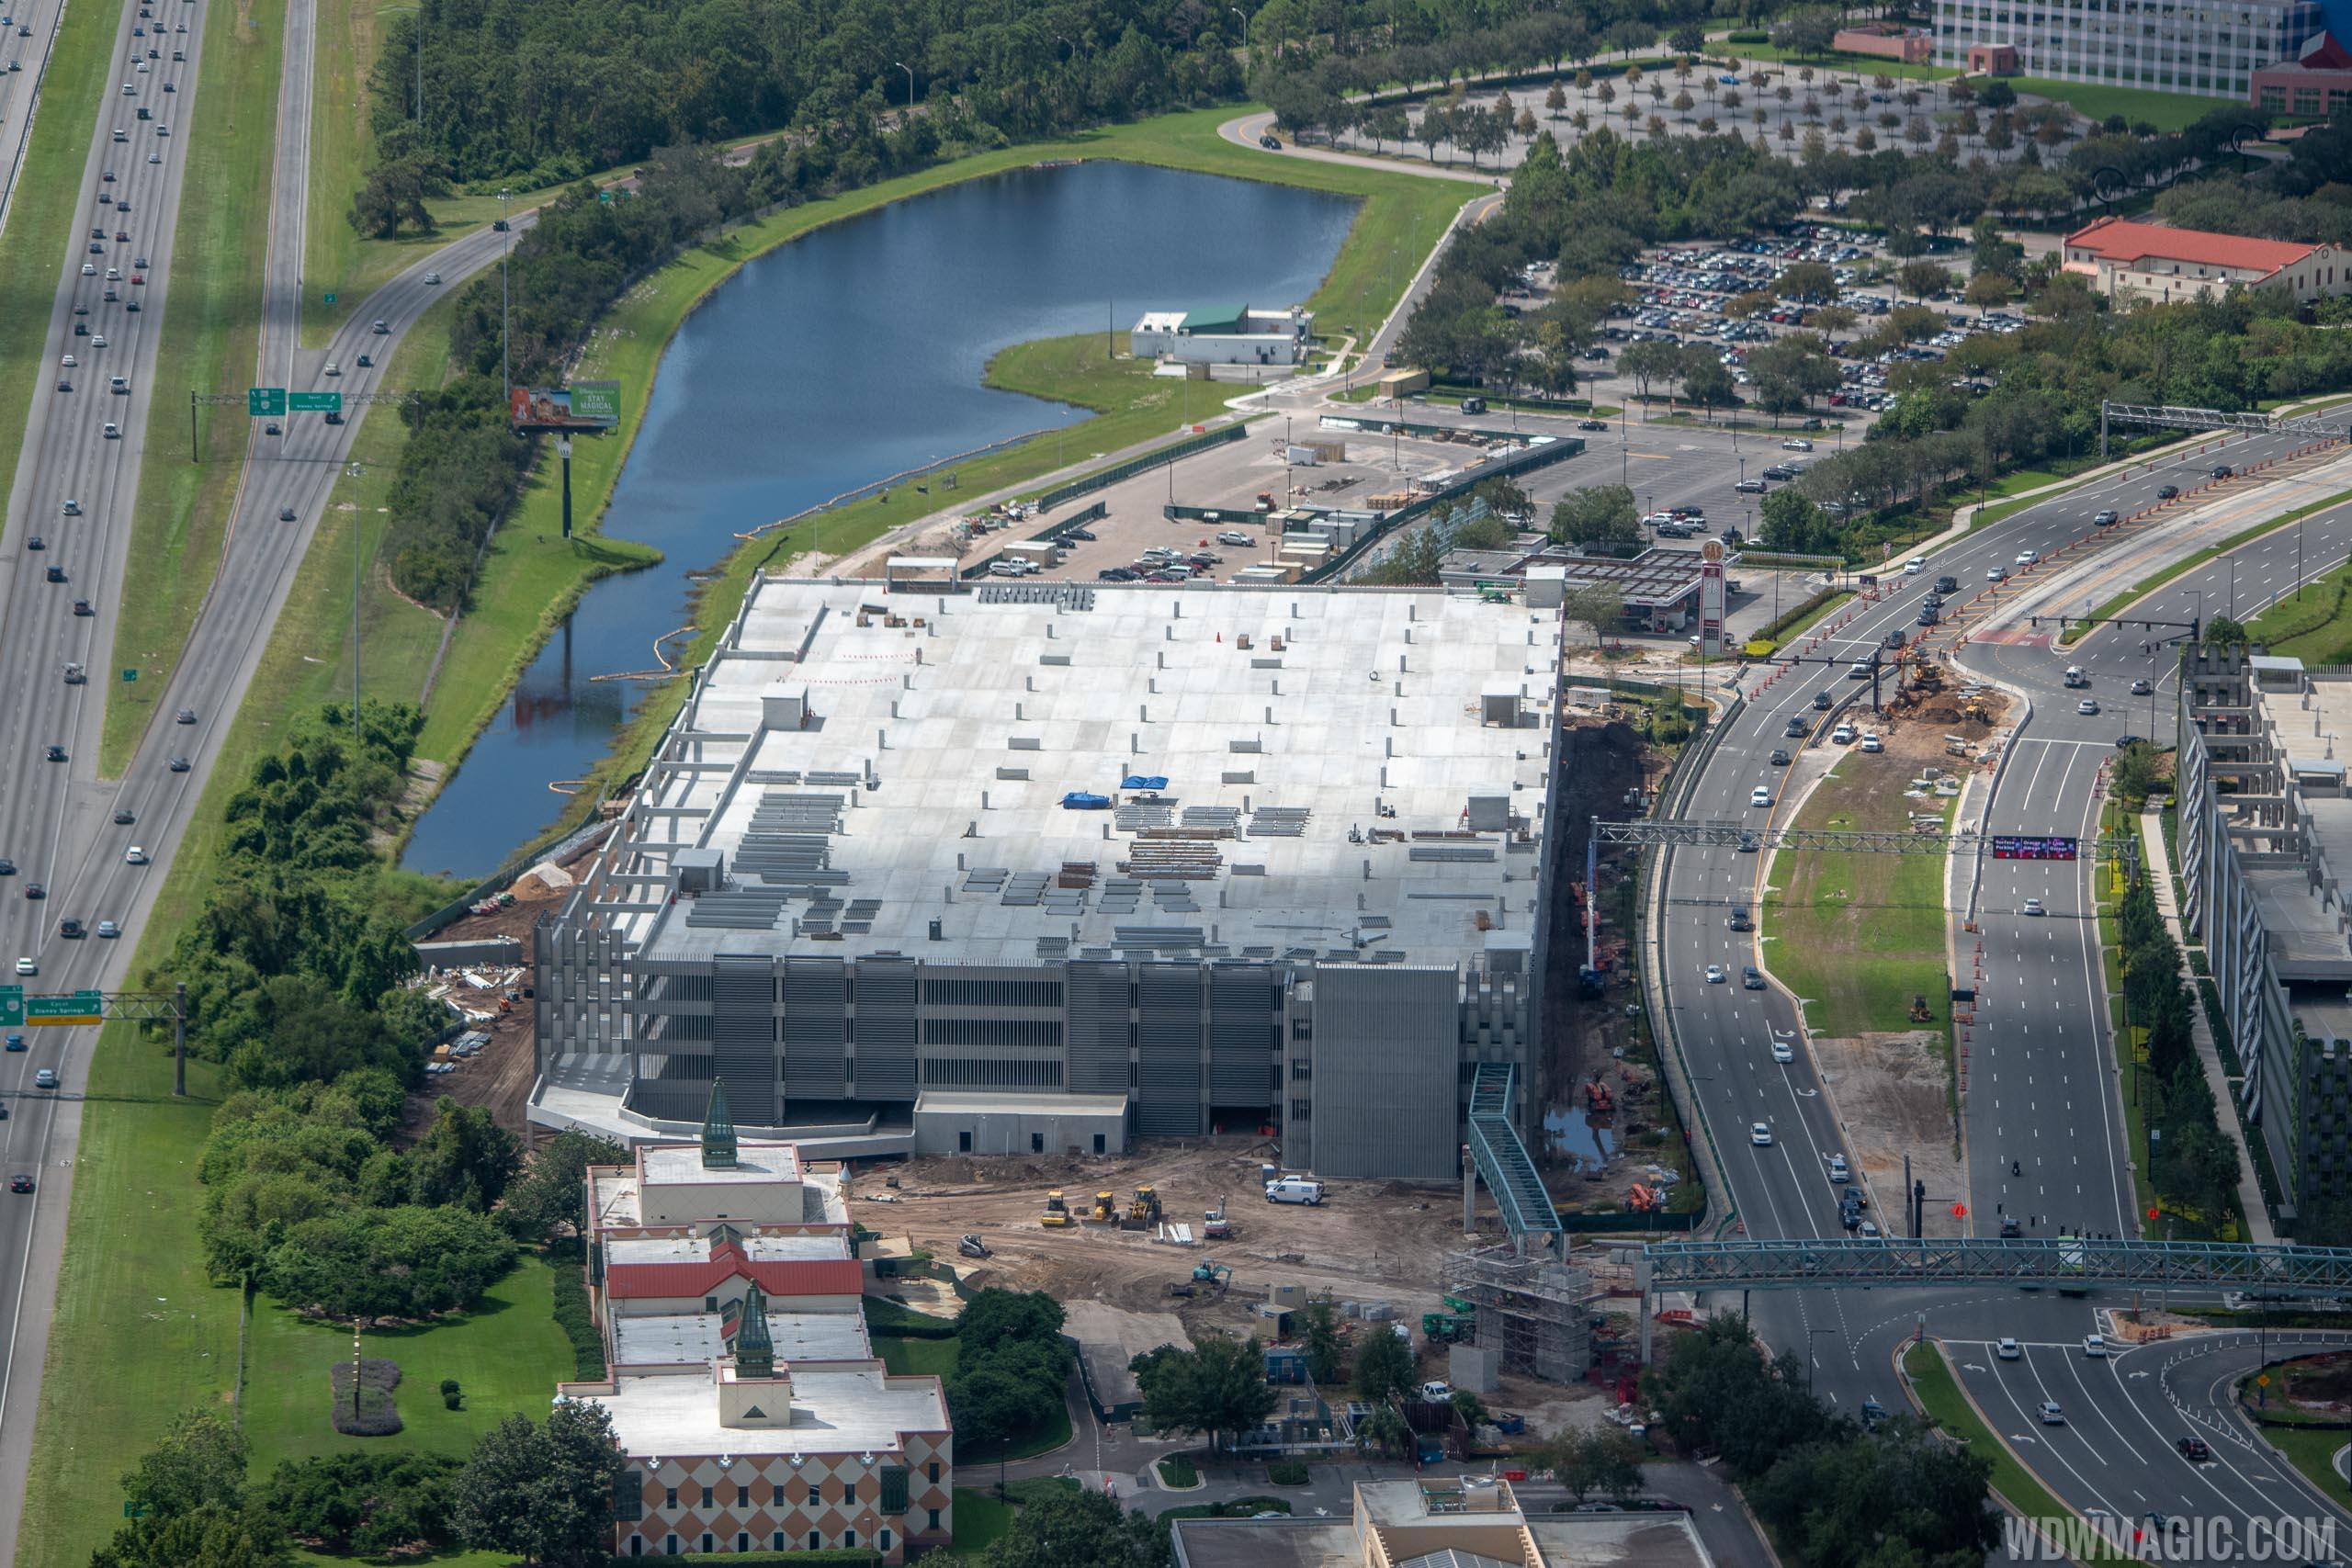 Disney Springs third parking lot construction - September 2018